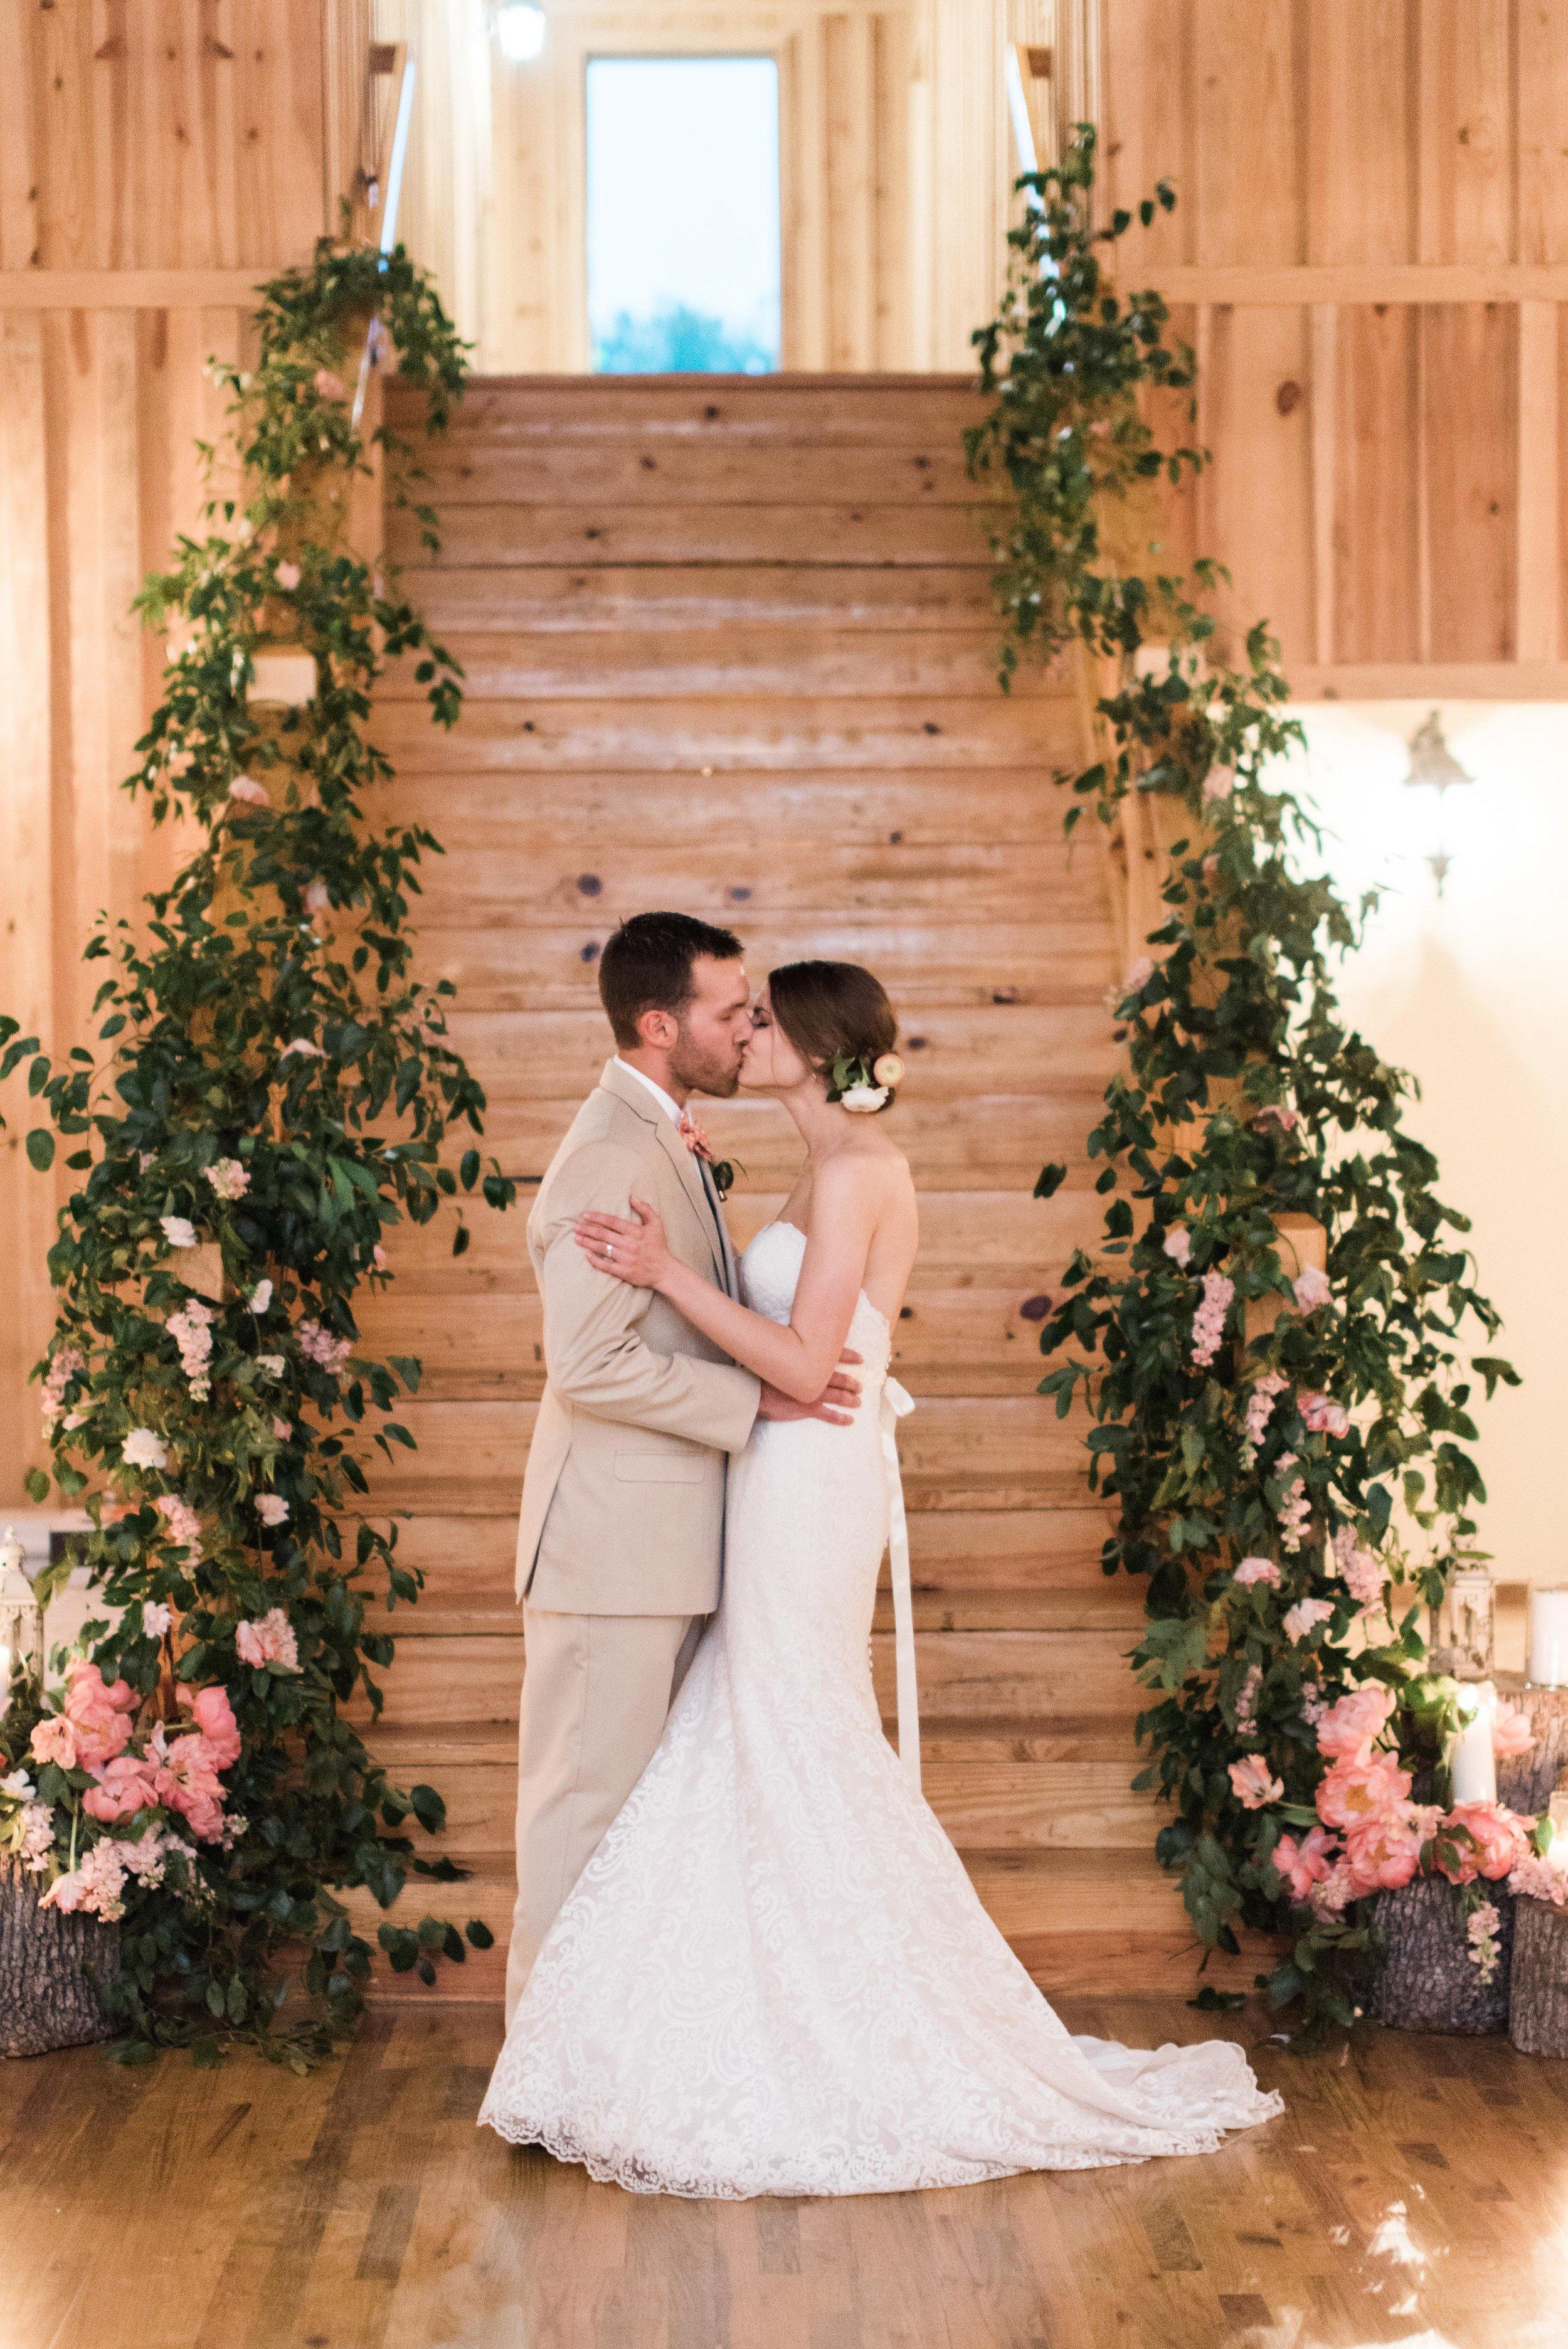 The-Knot-Wedding-Houston-Photographer-Fine-Art-Dana-Fernandez-Photography-Film-32.jpg